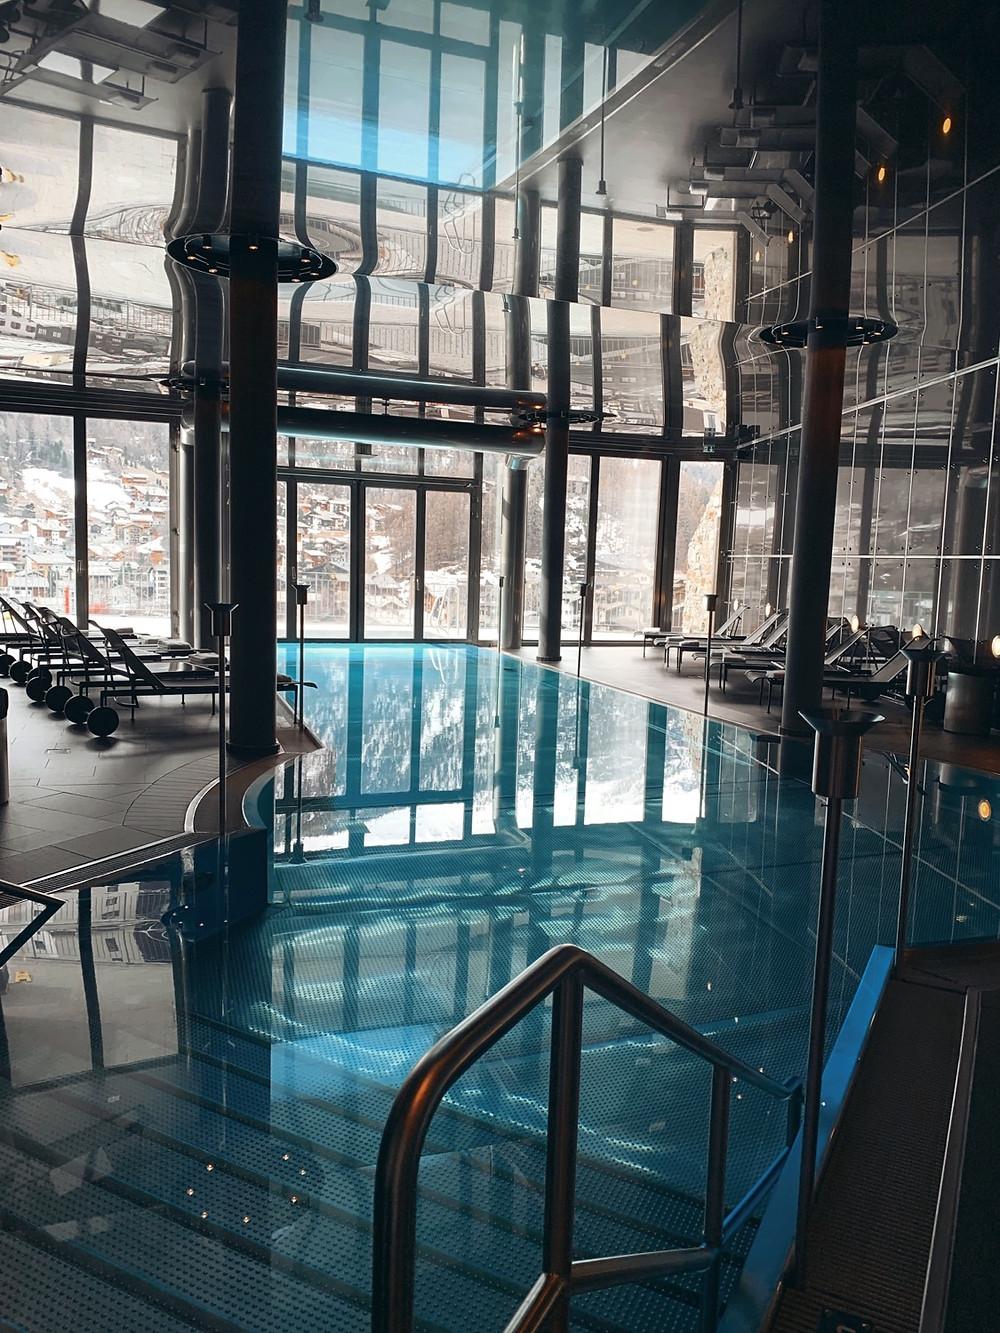 The Omnia Pool